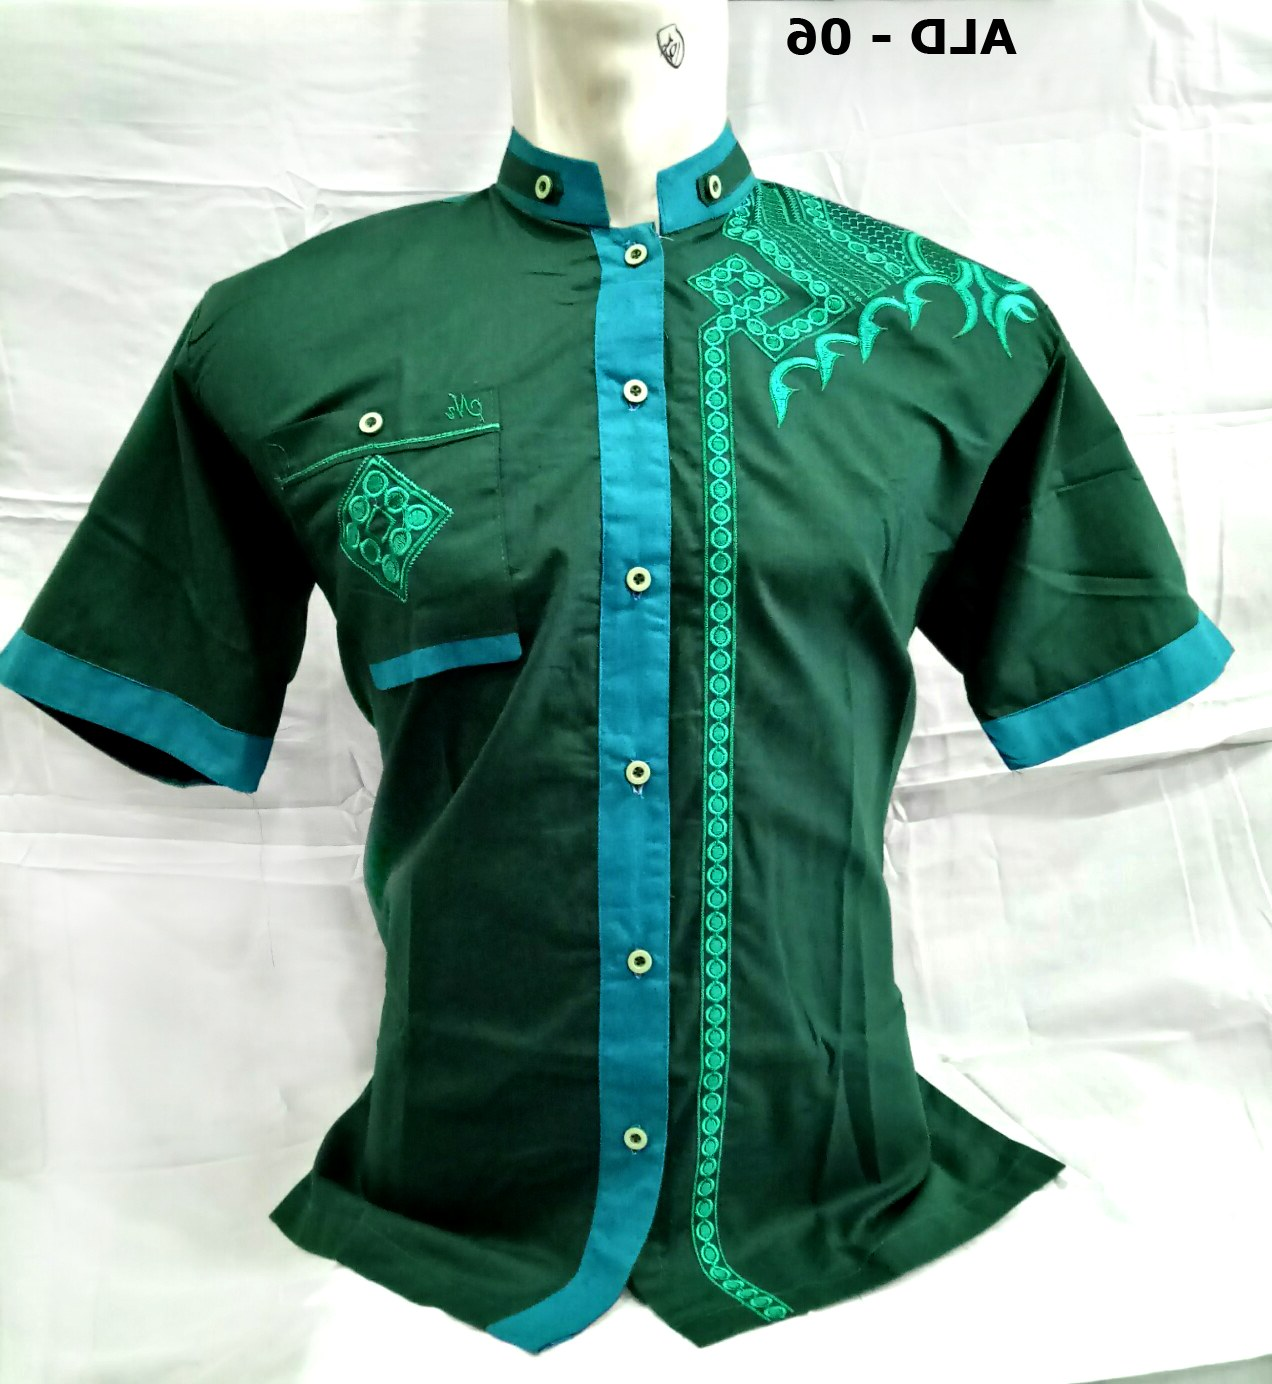 Inspirasi Harga Baju Lebaran Terbaru Gdd0 Model Baju Koko Lebaran 2018 Terbaru Dan Harganya Murah